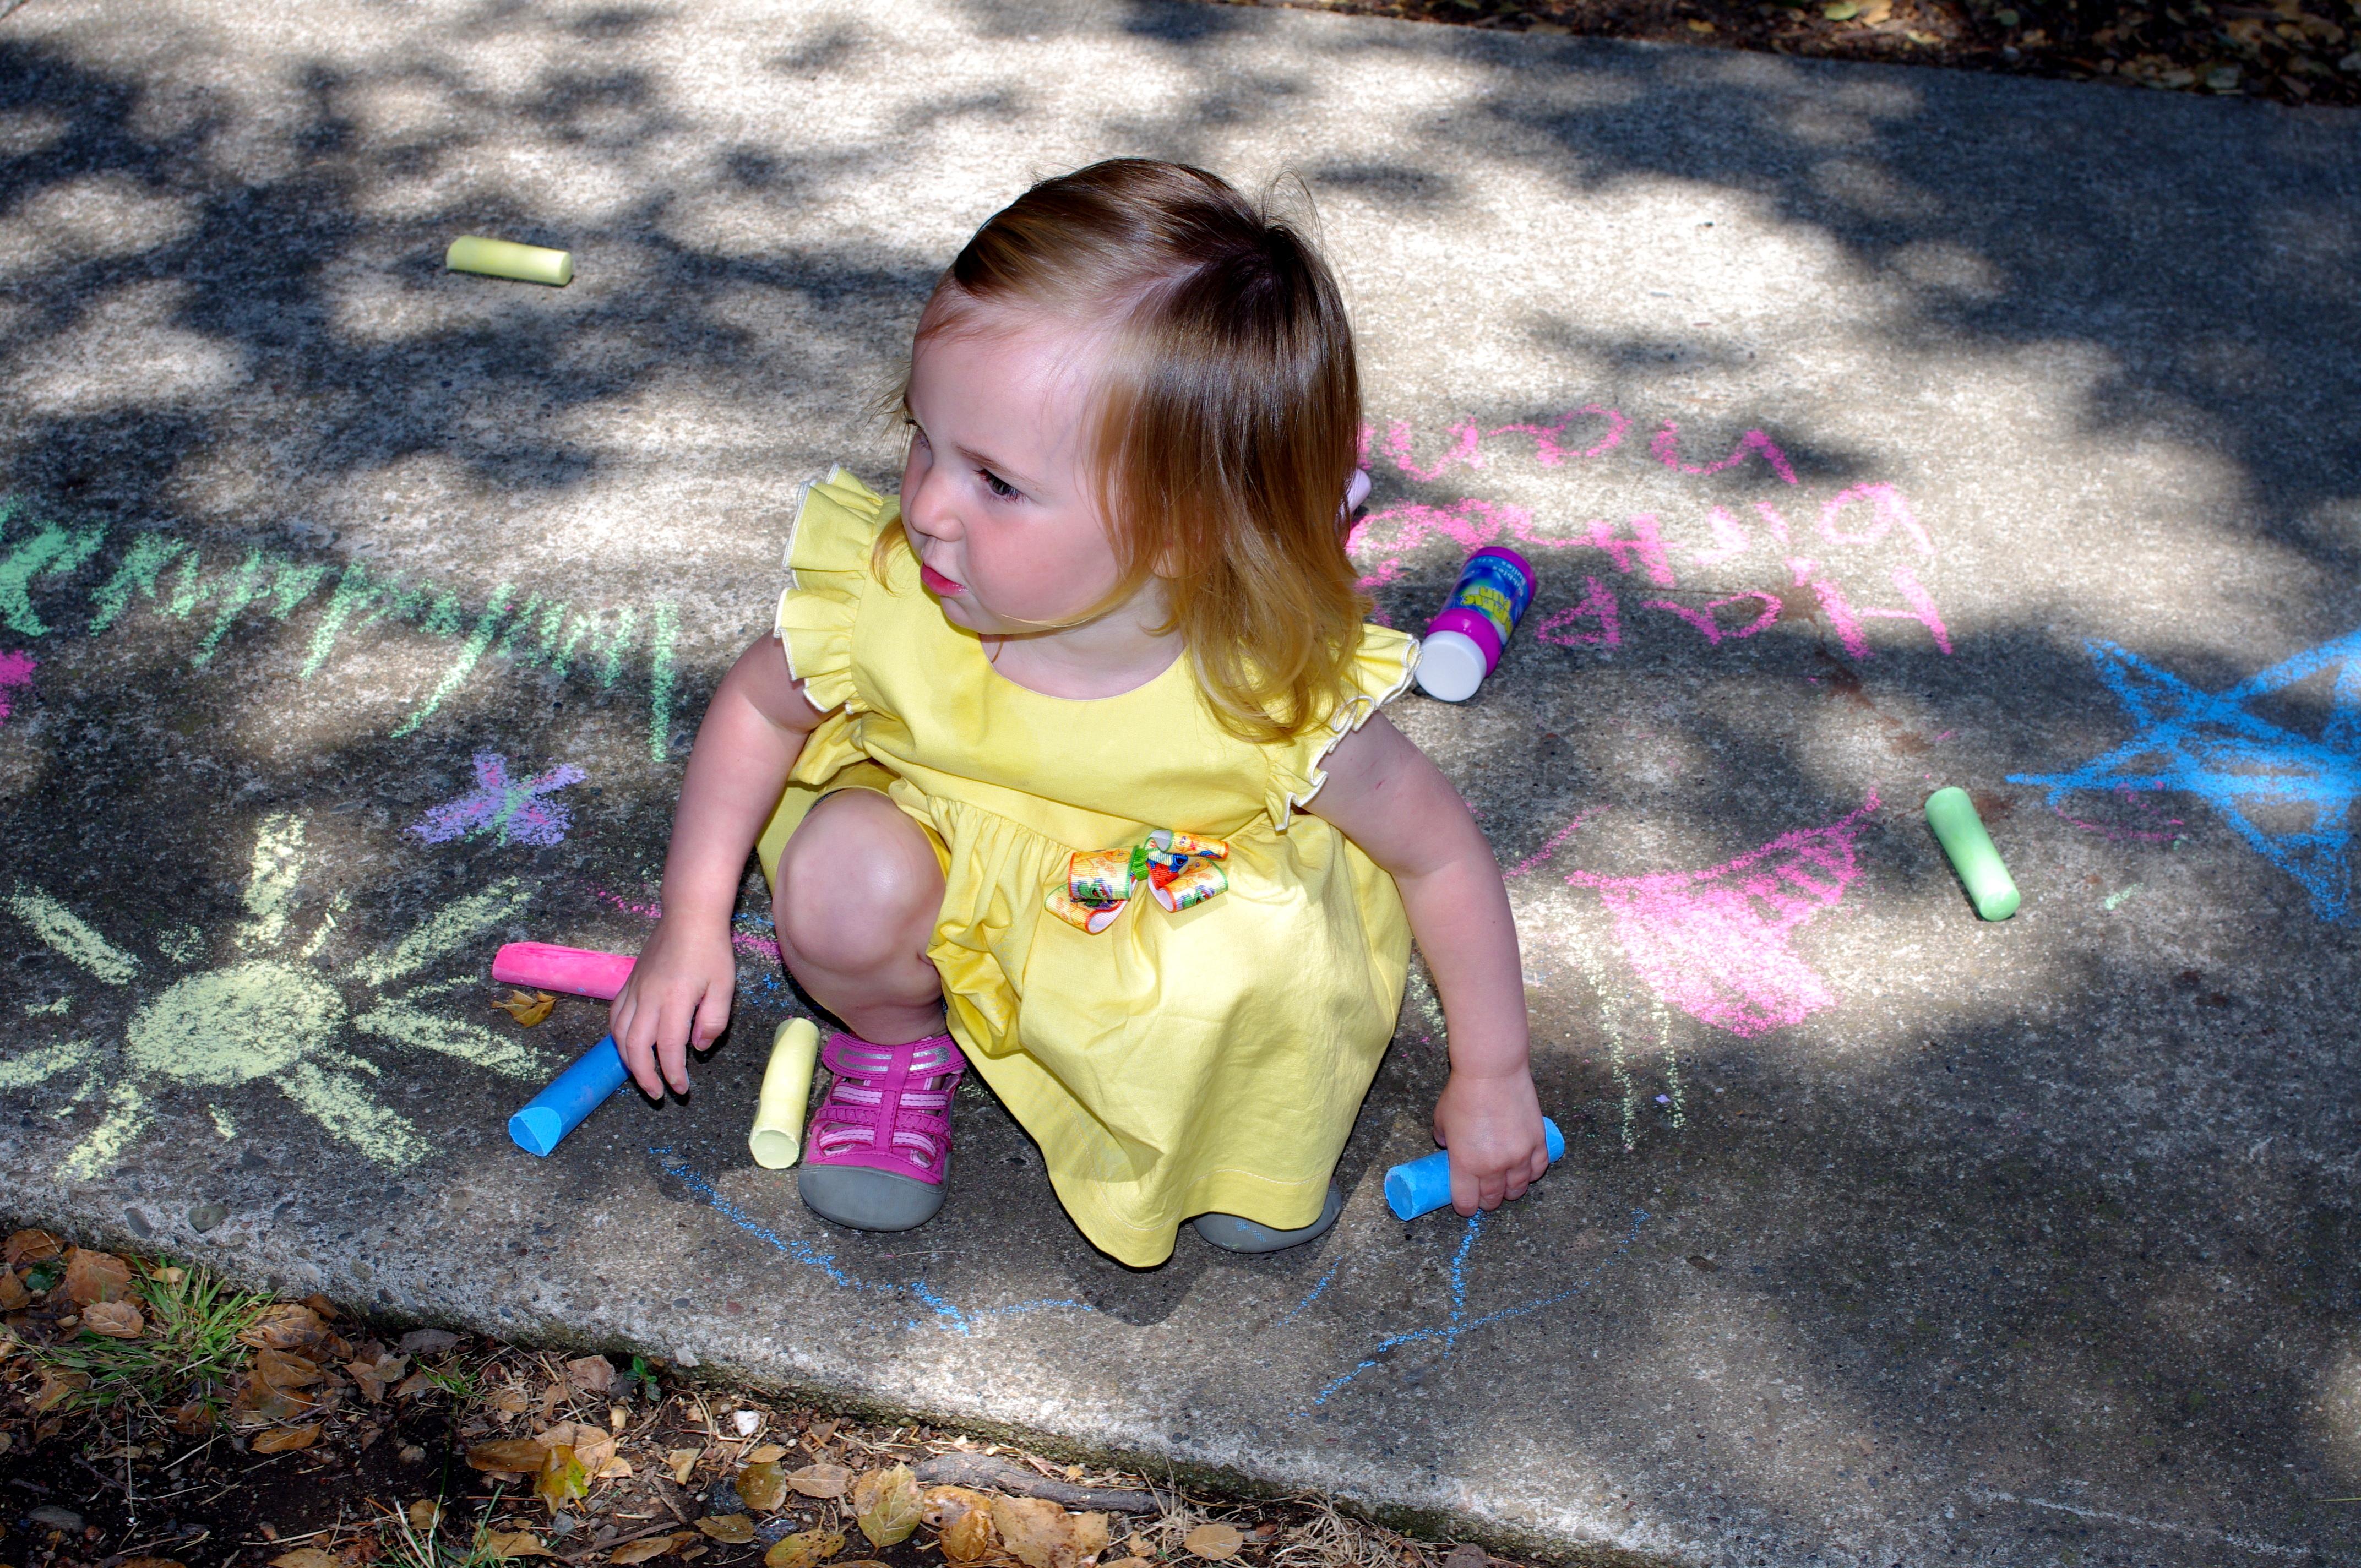 Sidewalk Chalk Clip Art Bert's sidewalk chalk station: